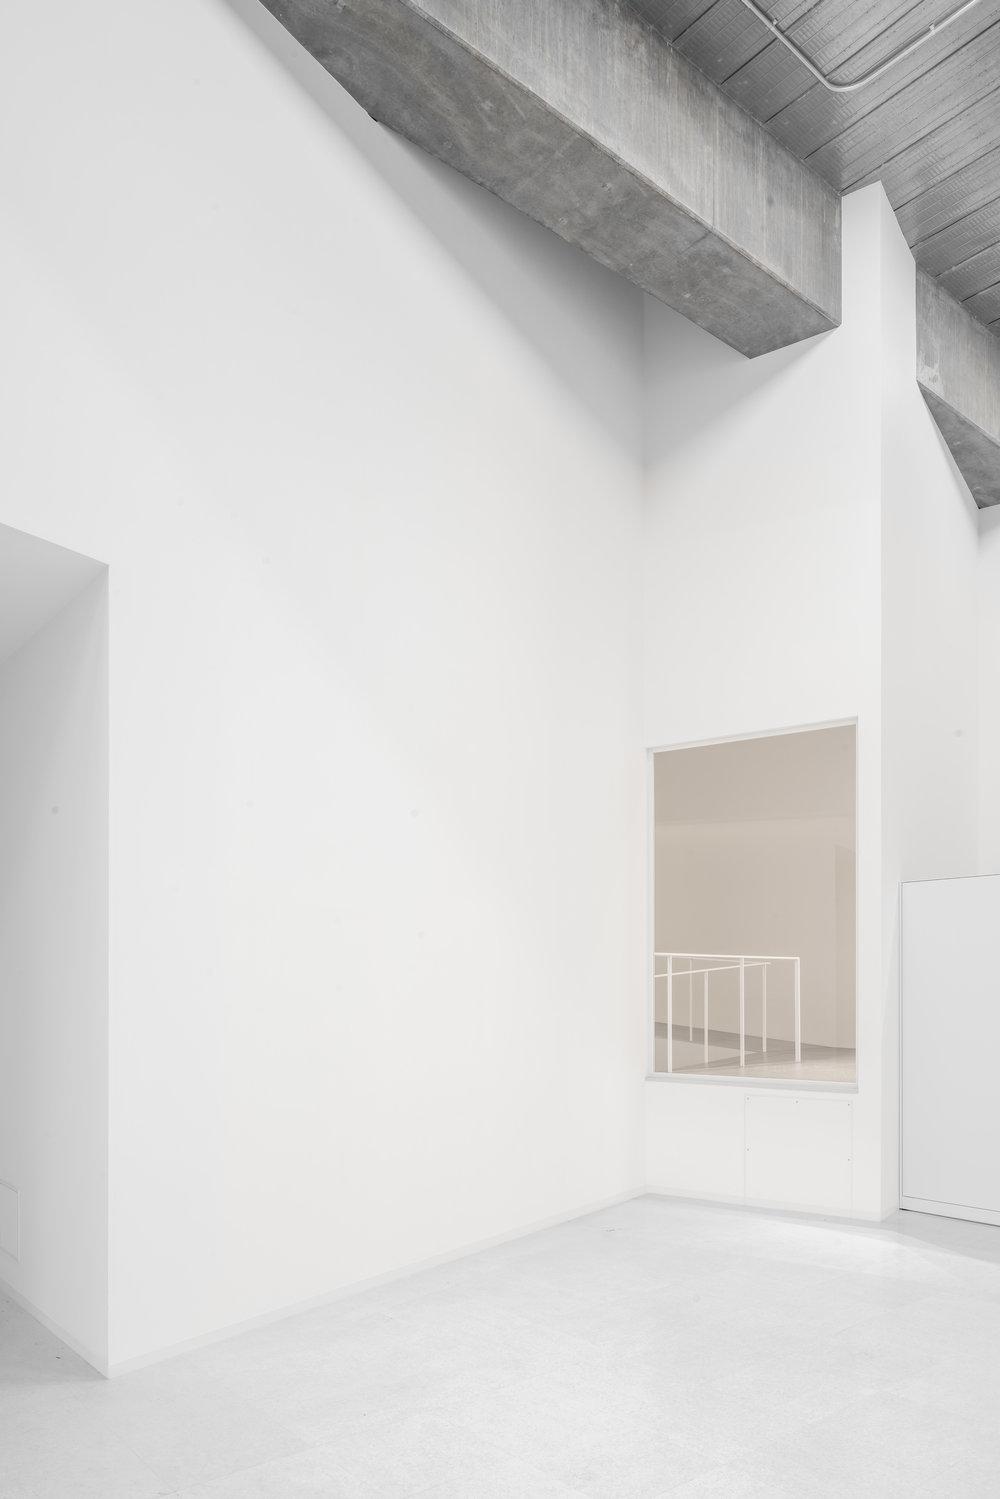 View Platform for the Photo Studio